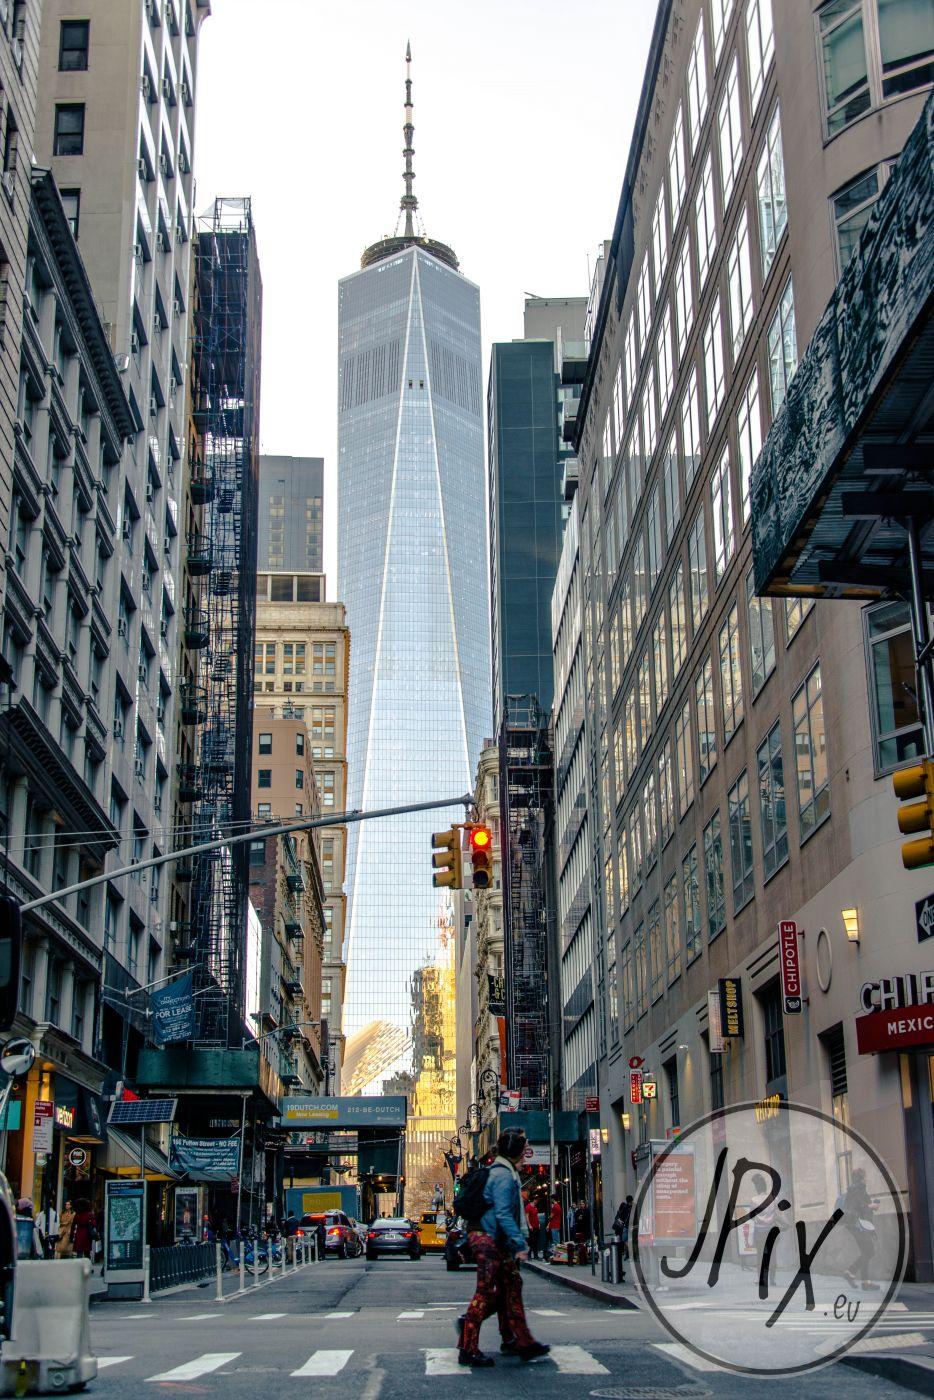 Freedom Tower New York at Fulton Street, USA